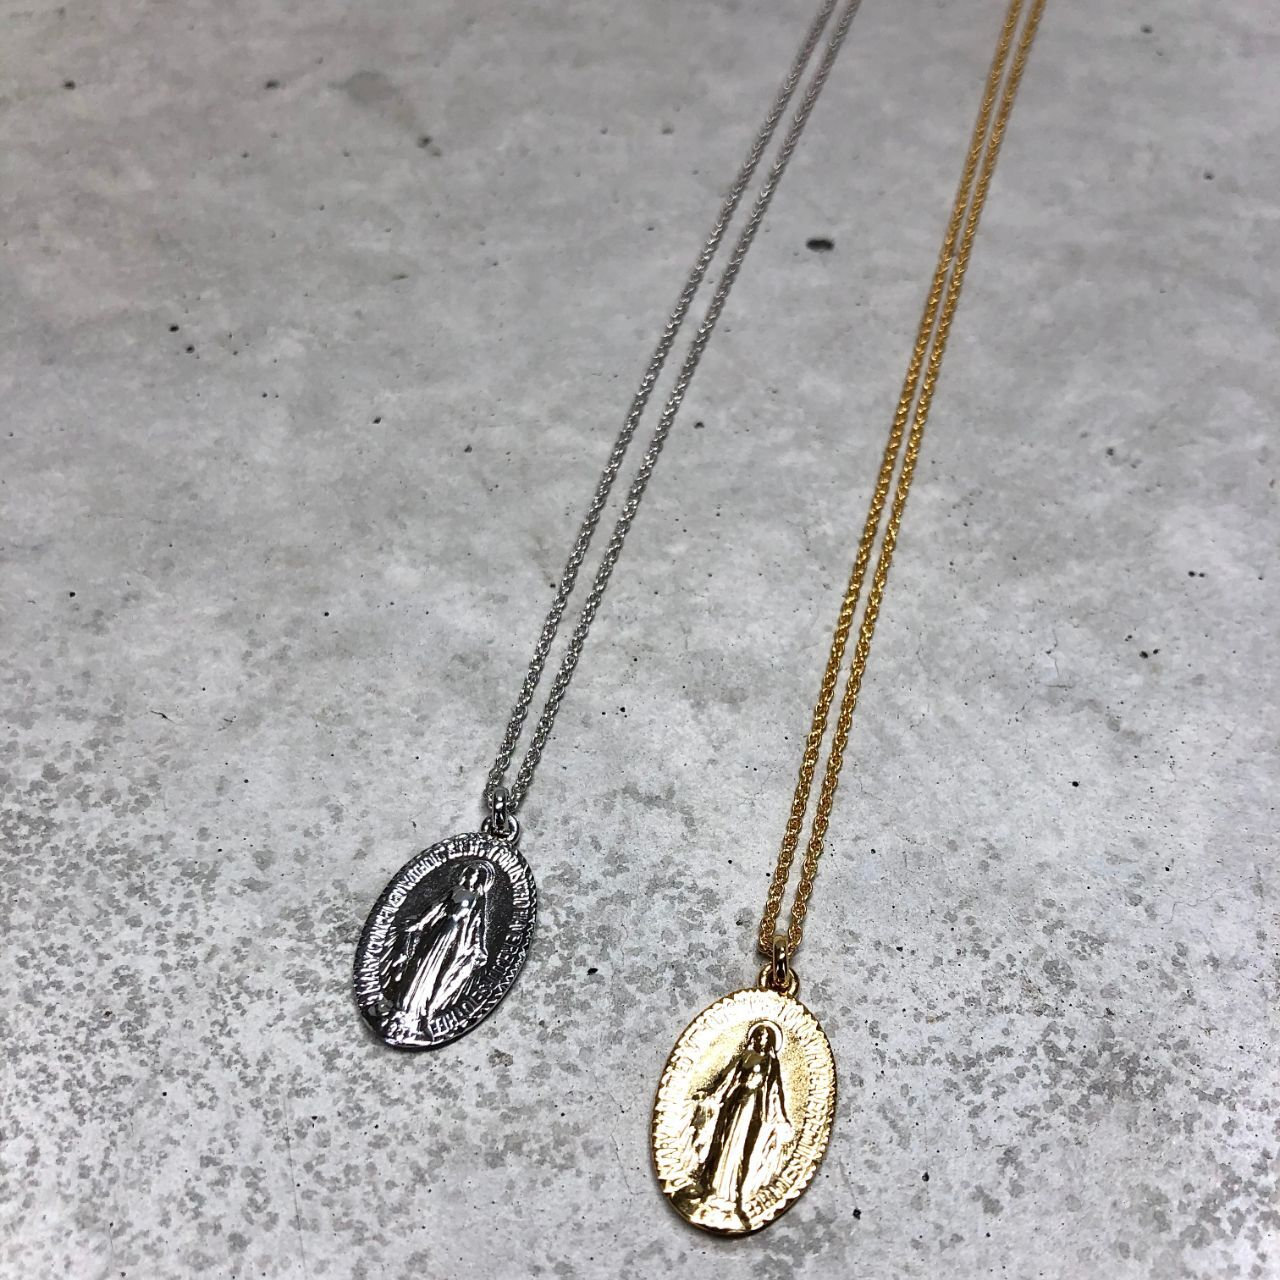 【MN-6BR】Medai pendant